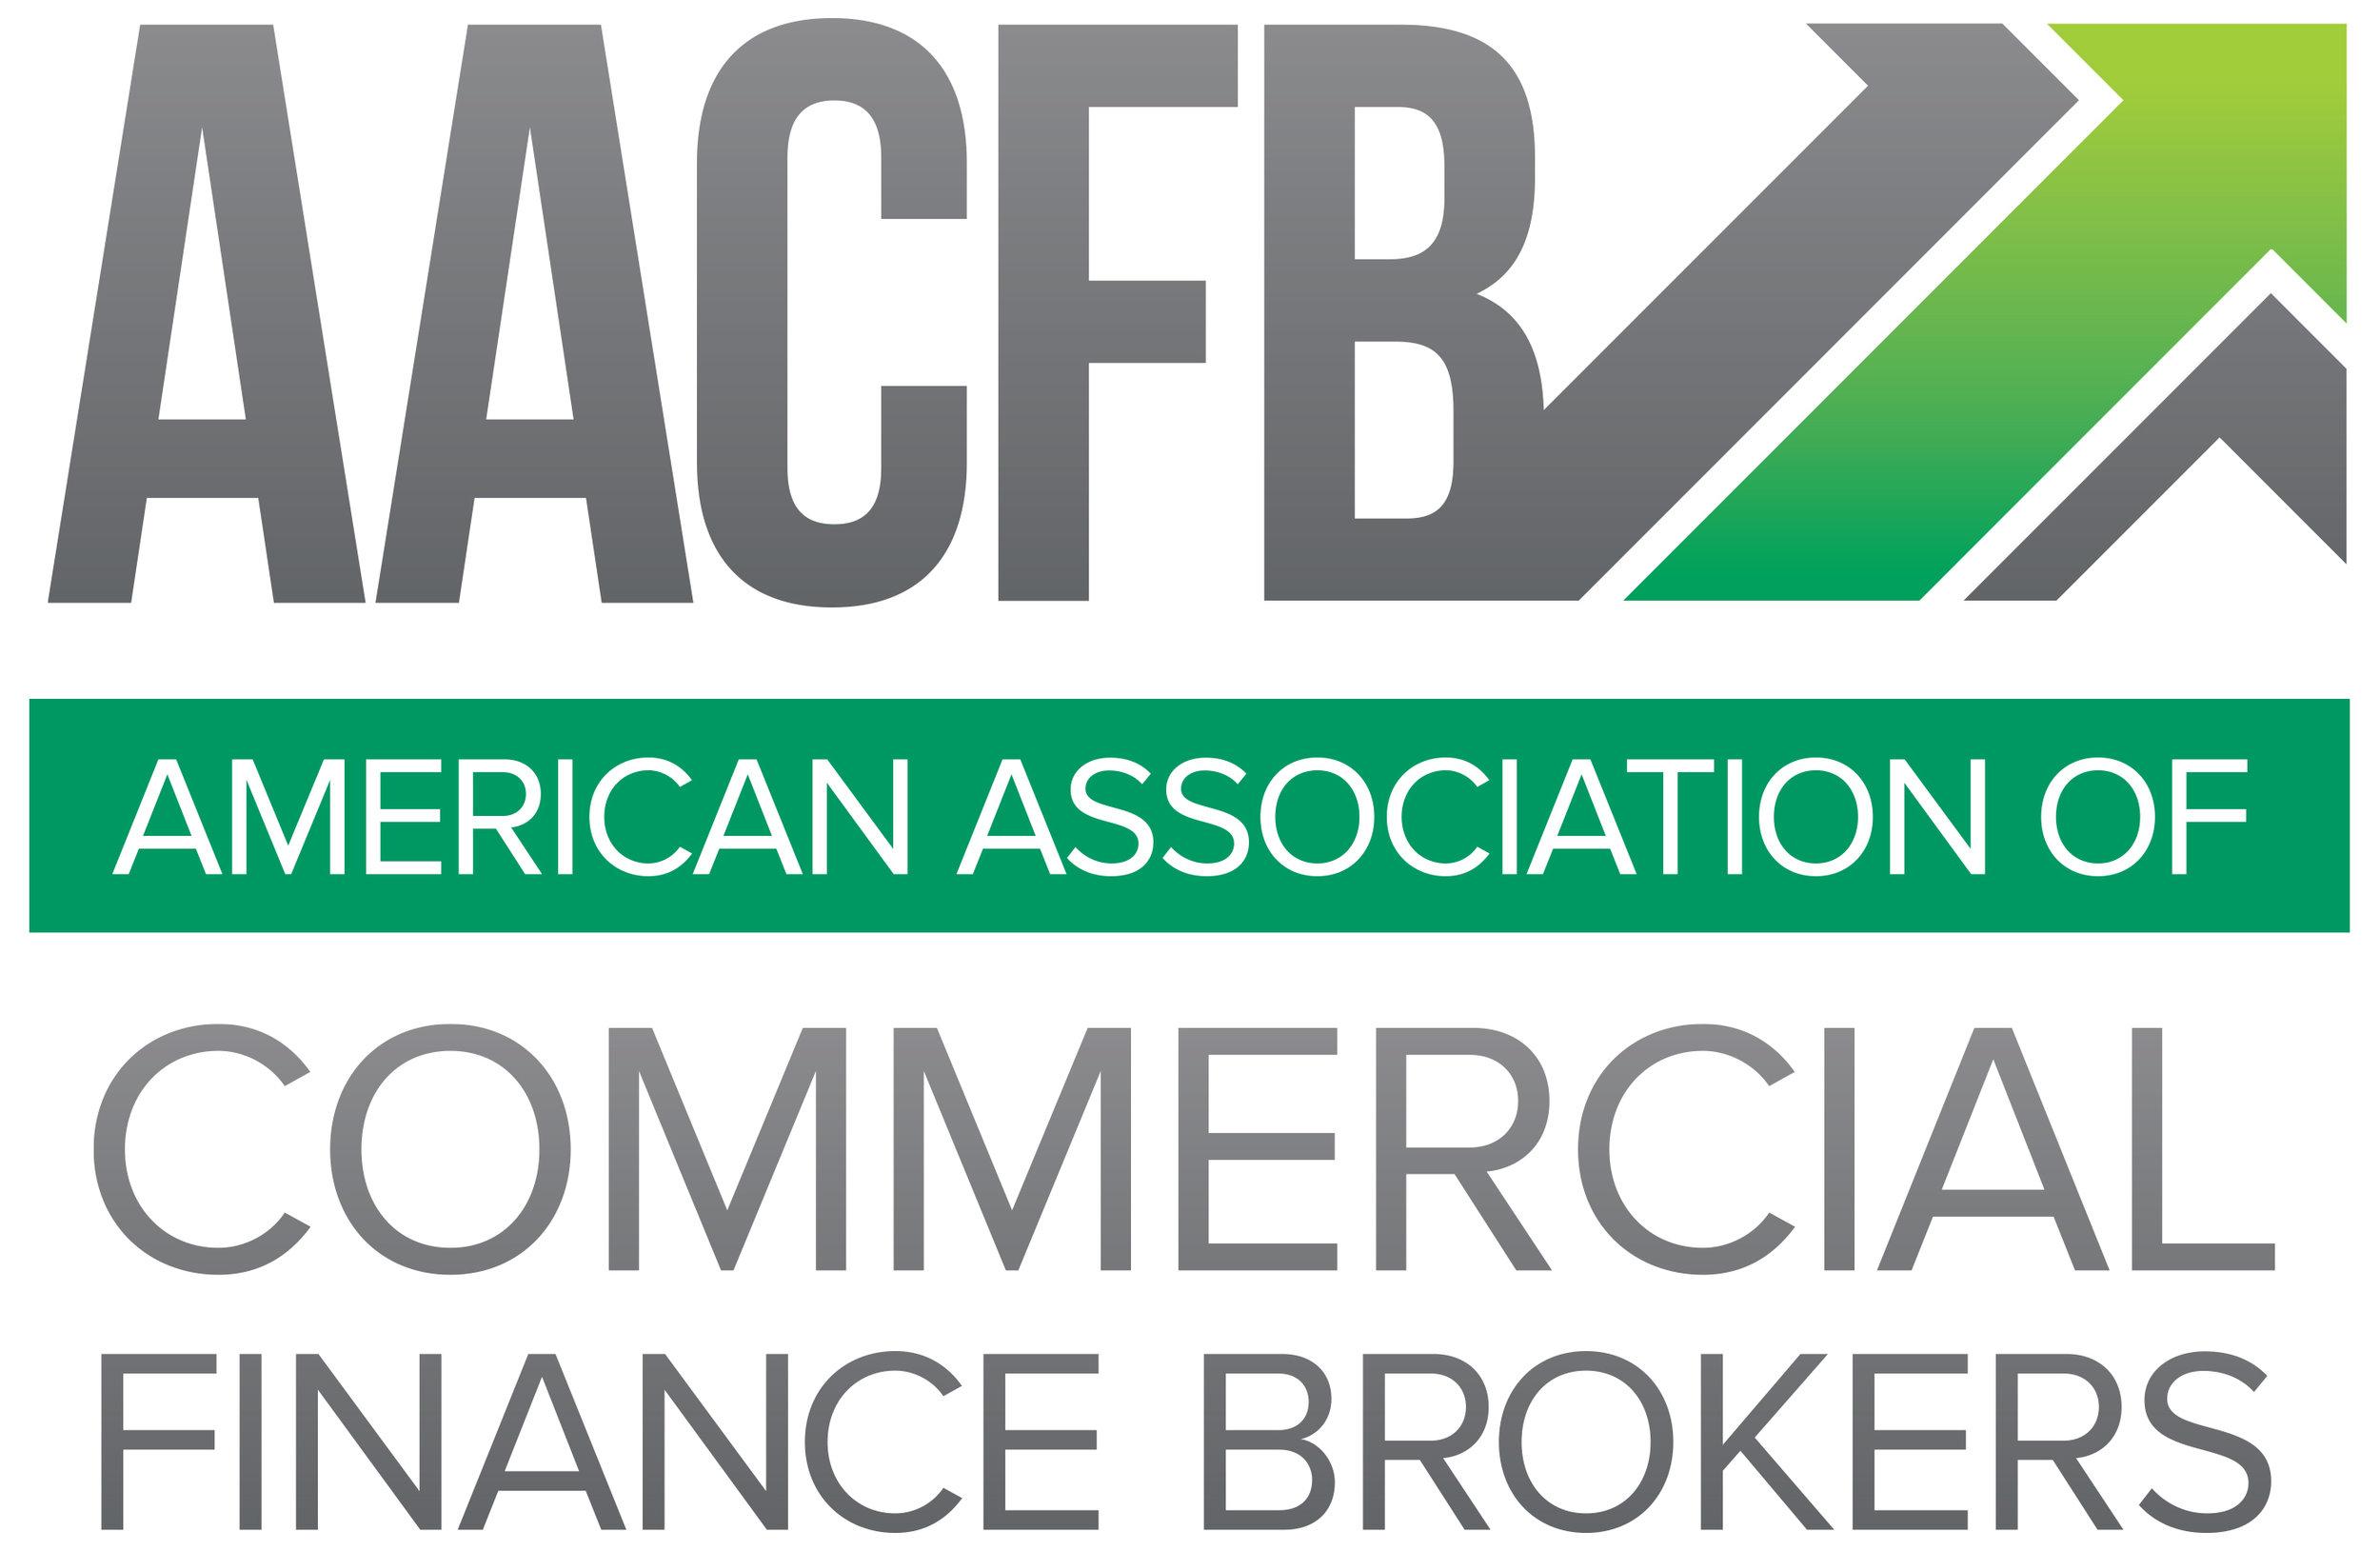 AACFB Logo.jpg